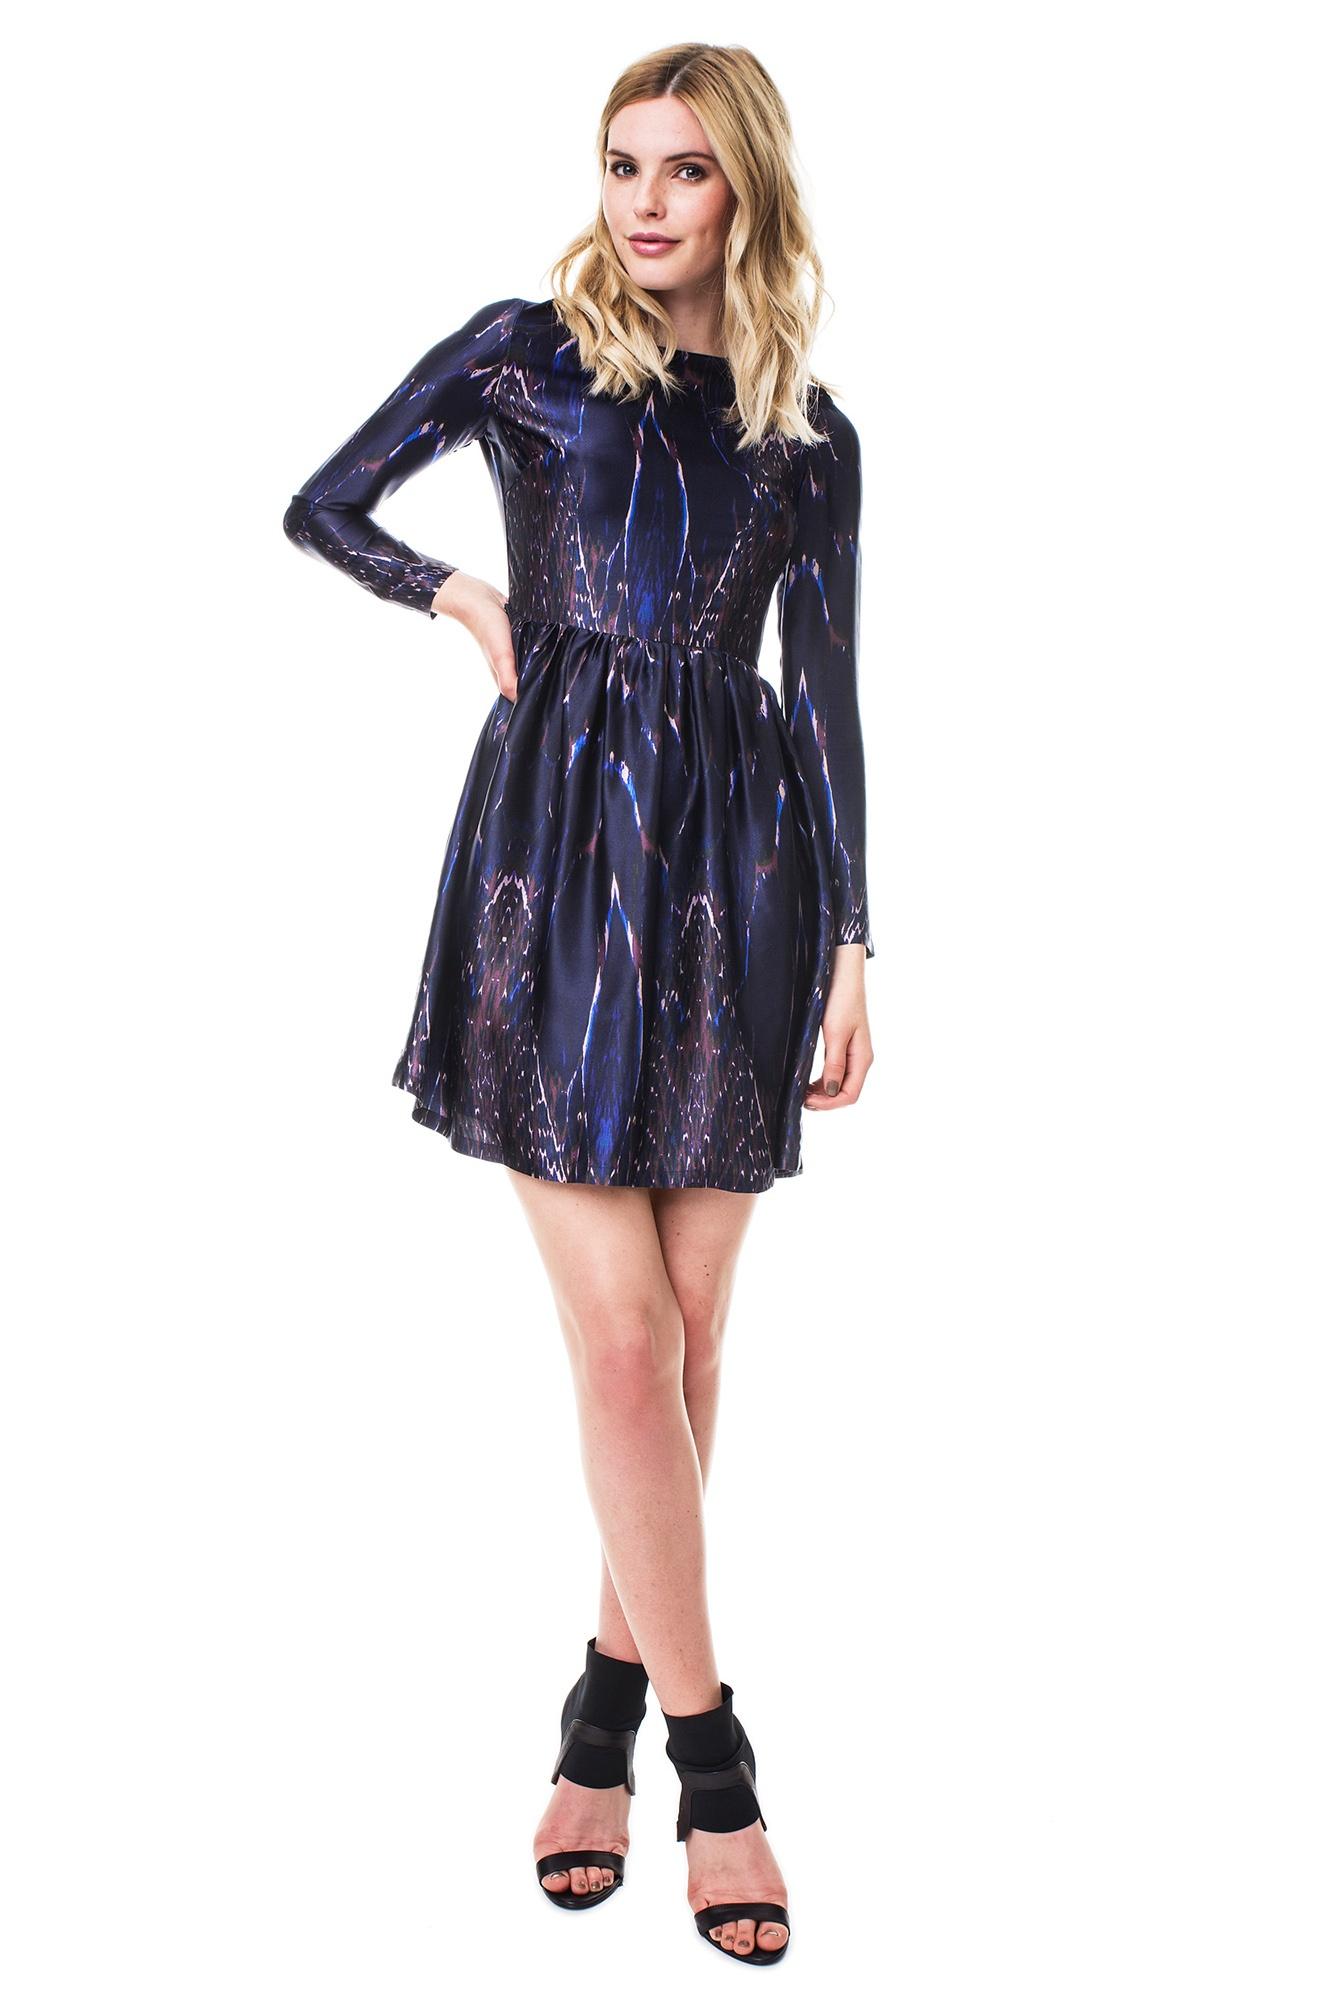 234_e6c2a31e77-meryl-dress-bluepython-bymalina3-big.jpg